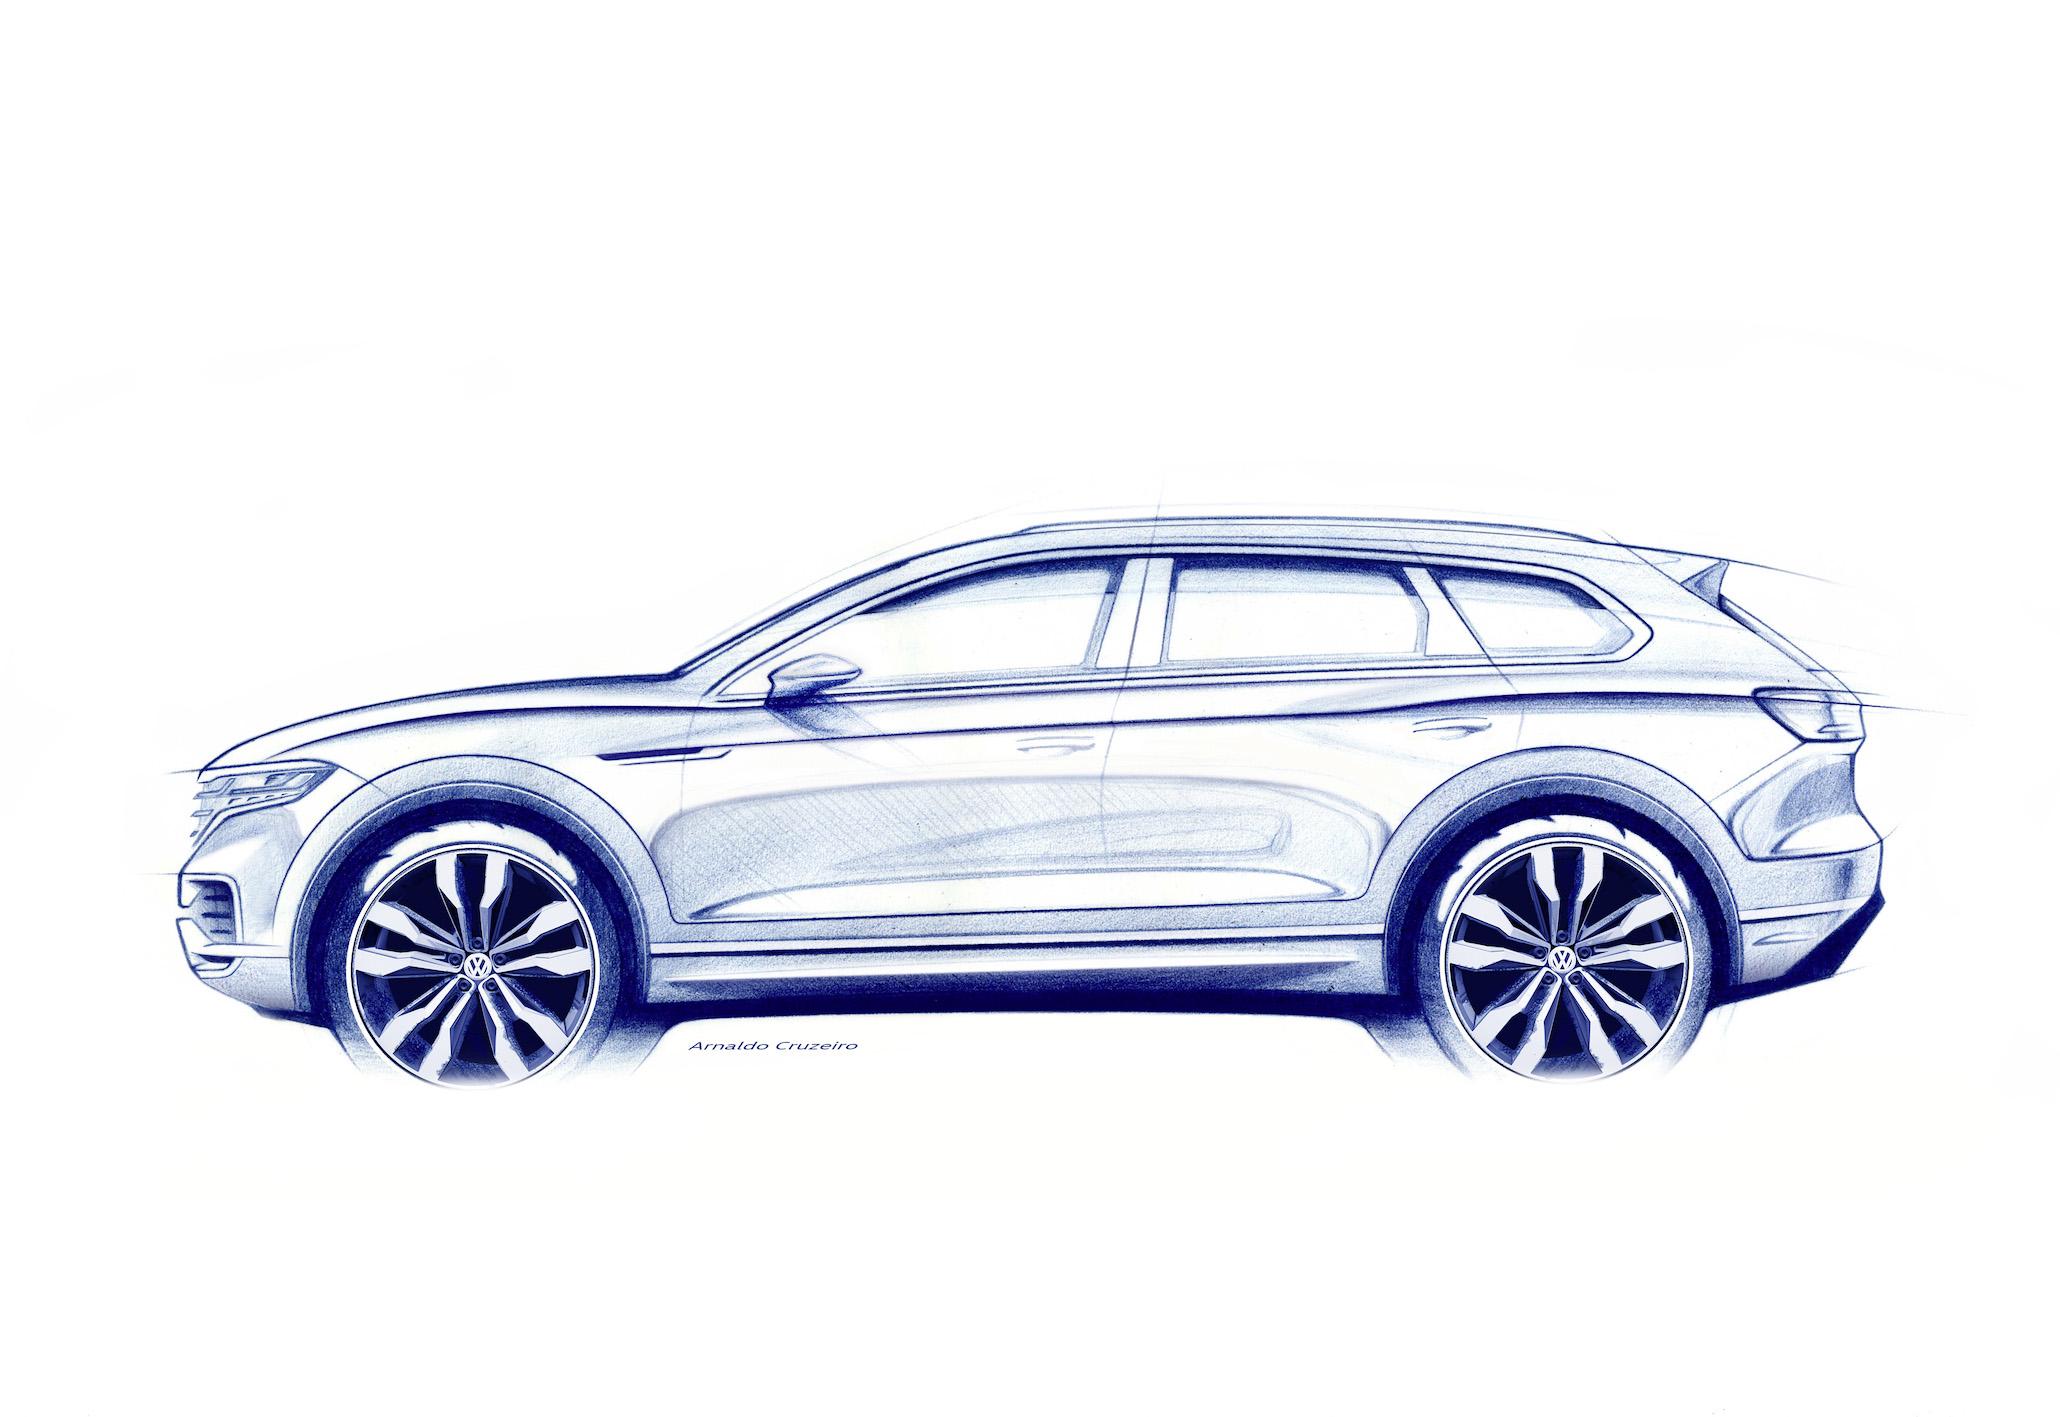 2019 Volkswagen Touareg sketch